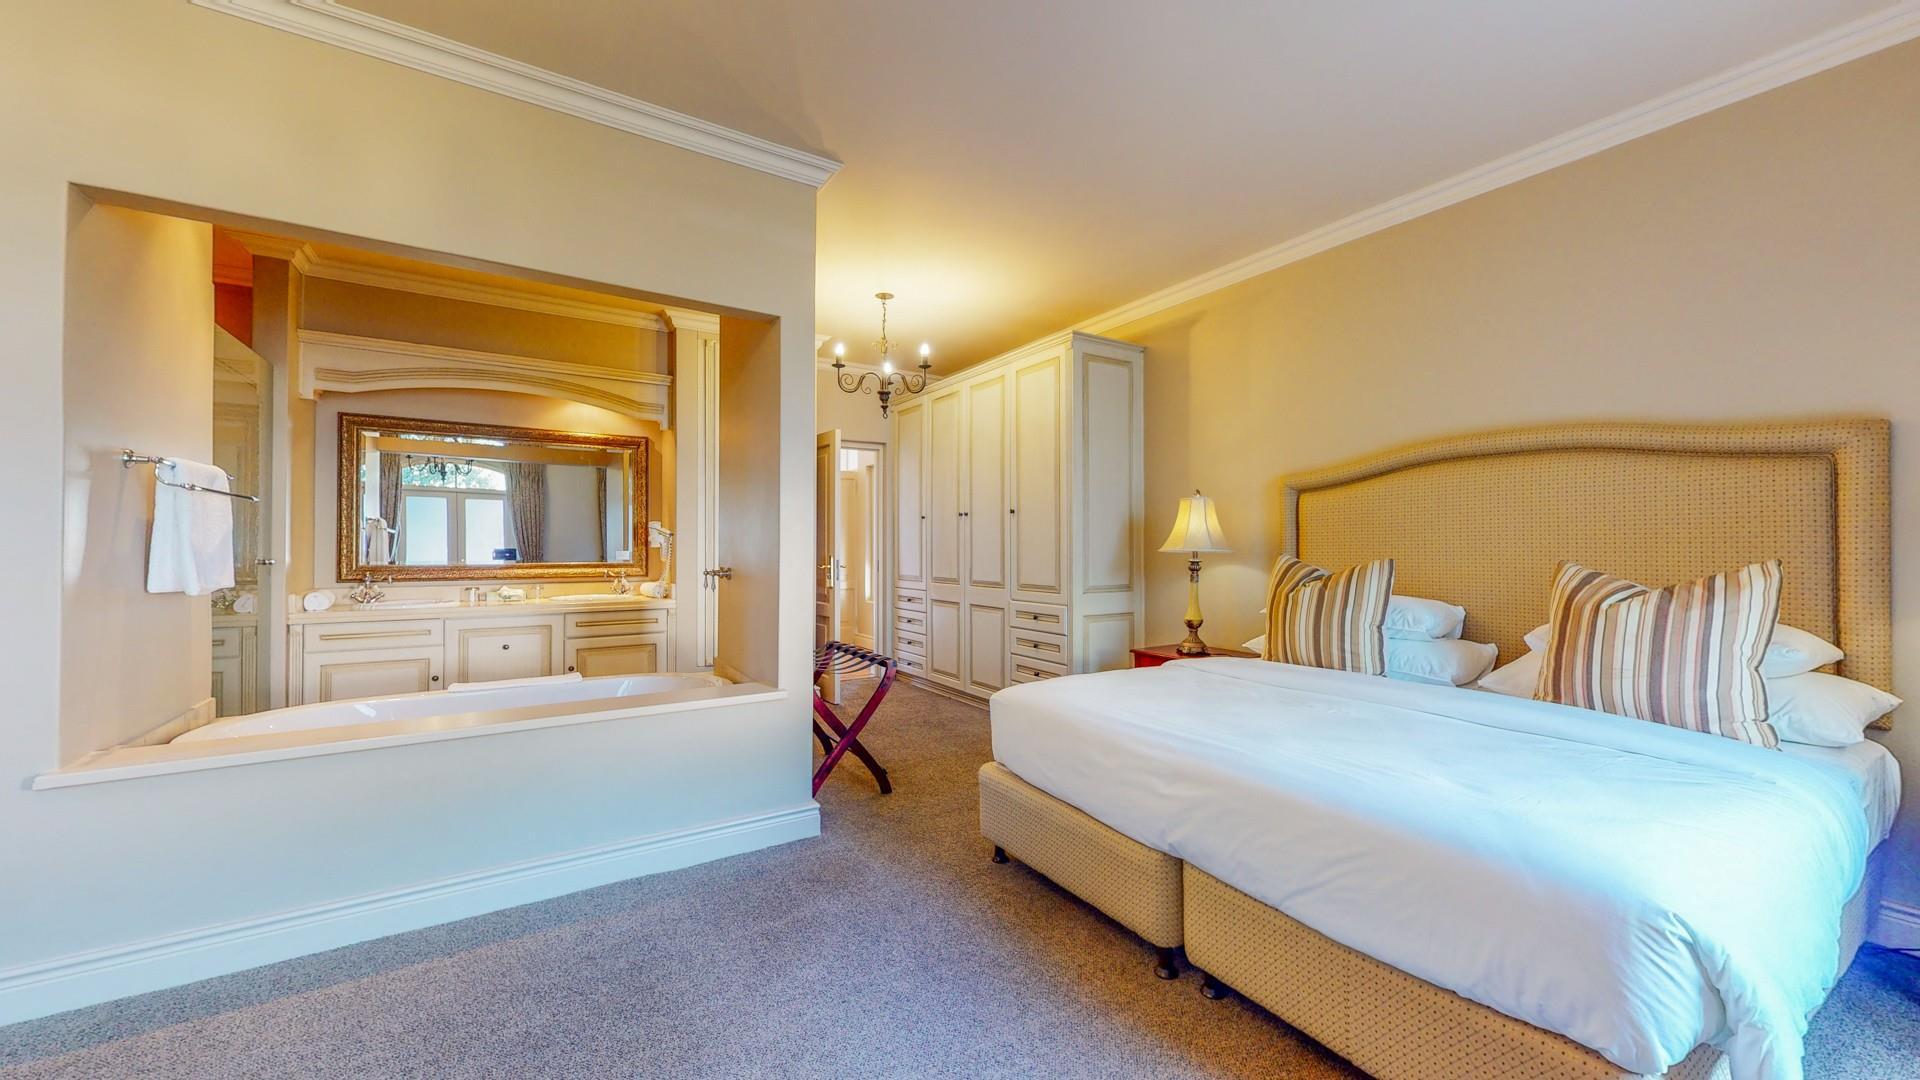 1 Bedroom Apartment / Flat For Sale in Franschhoek